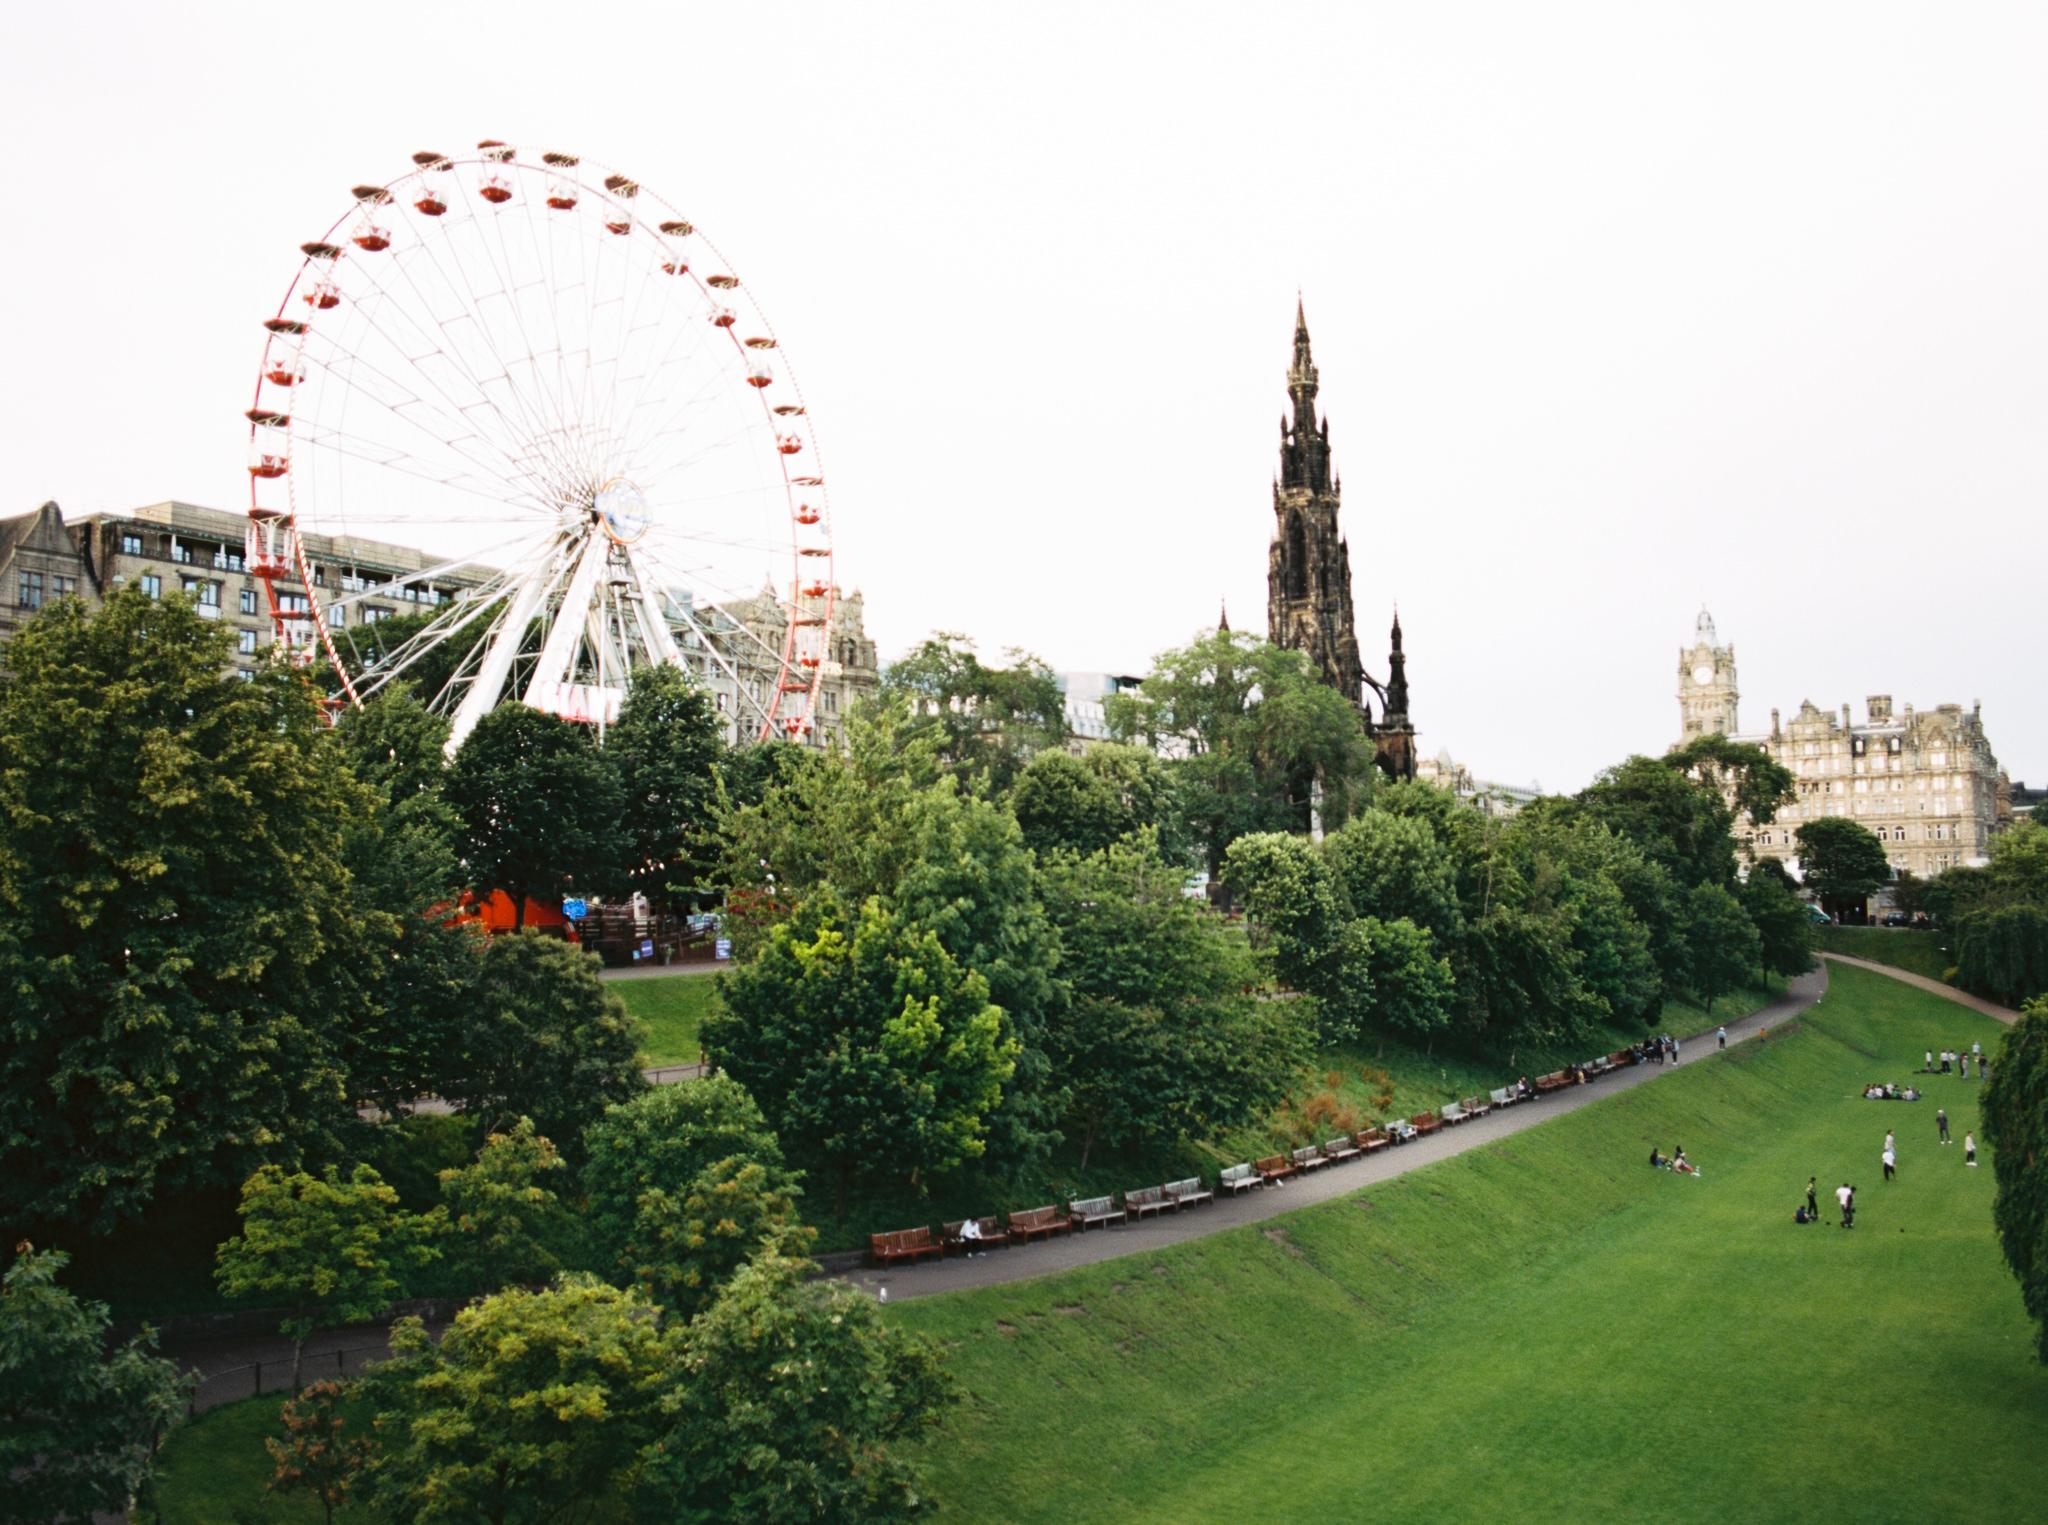 Scotland_Glasgow+Edinburgh_Day2-4.jpg